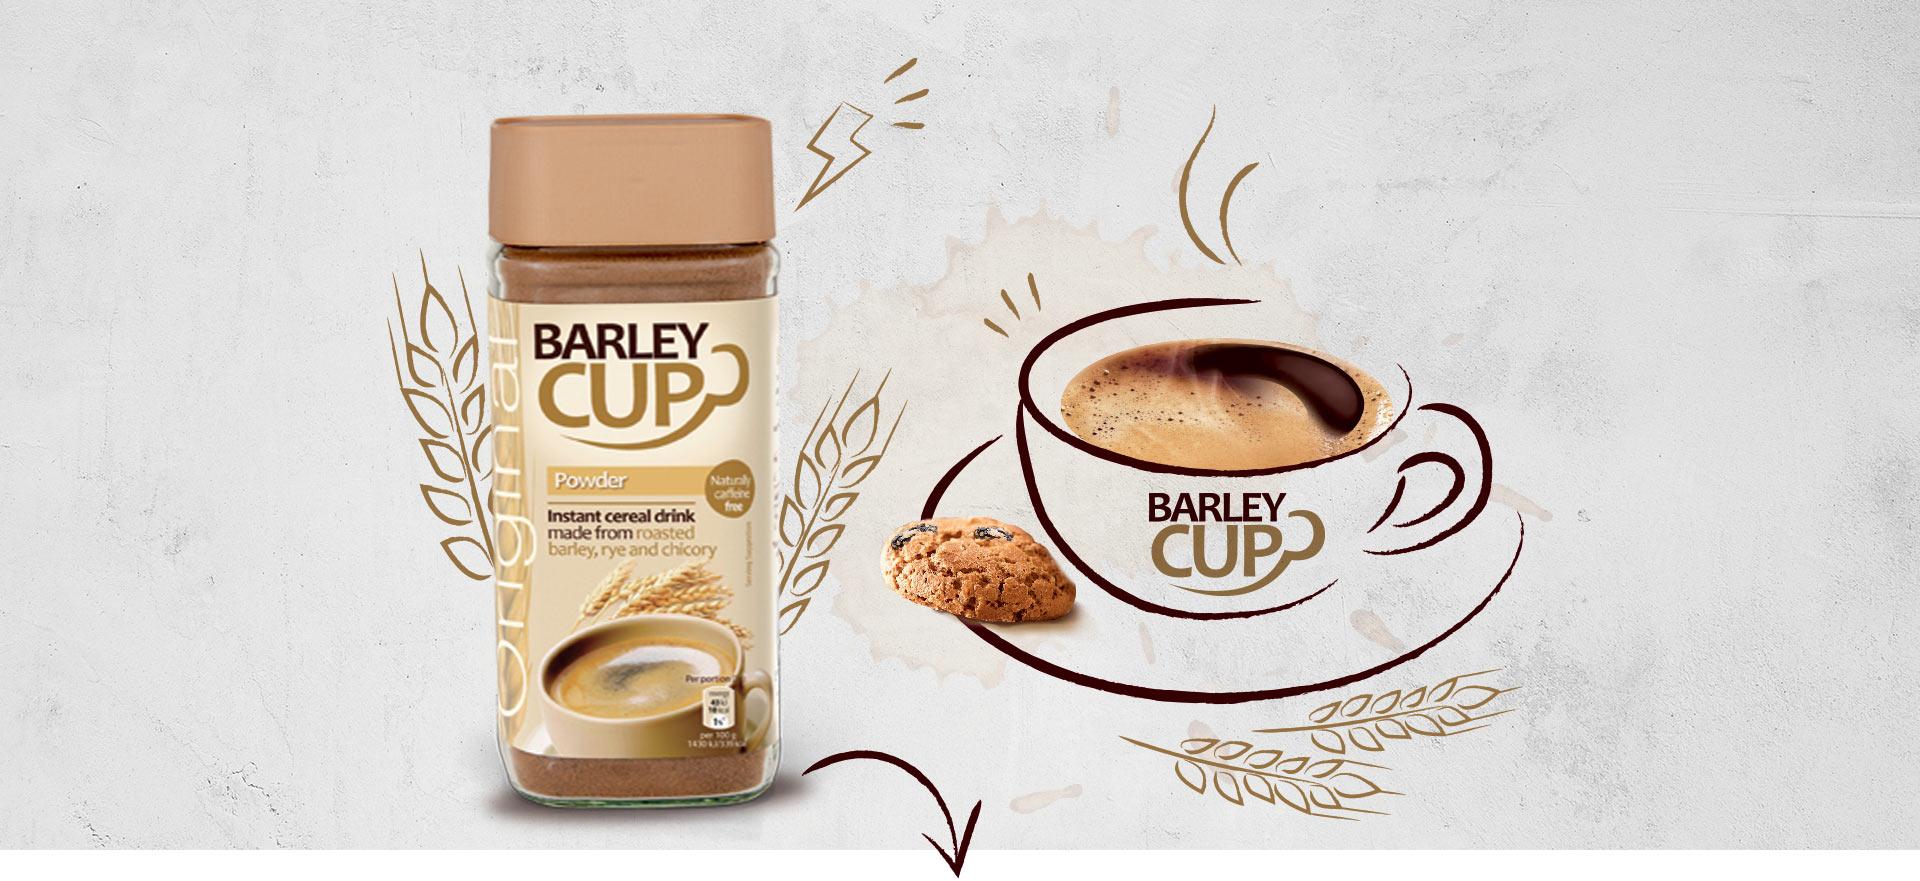 Barleycup in powder